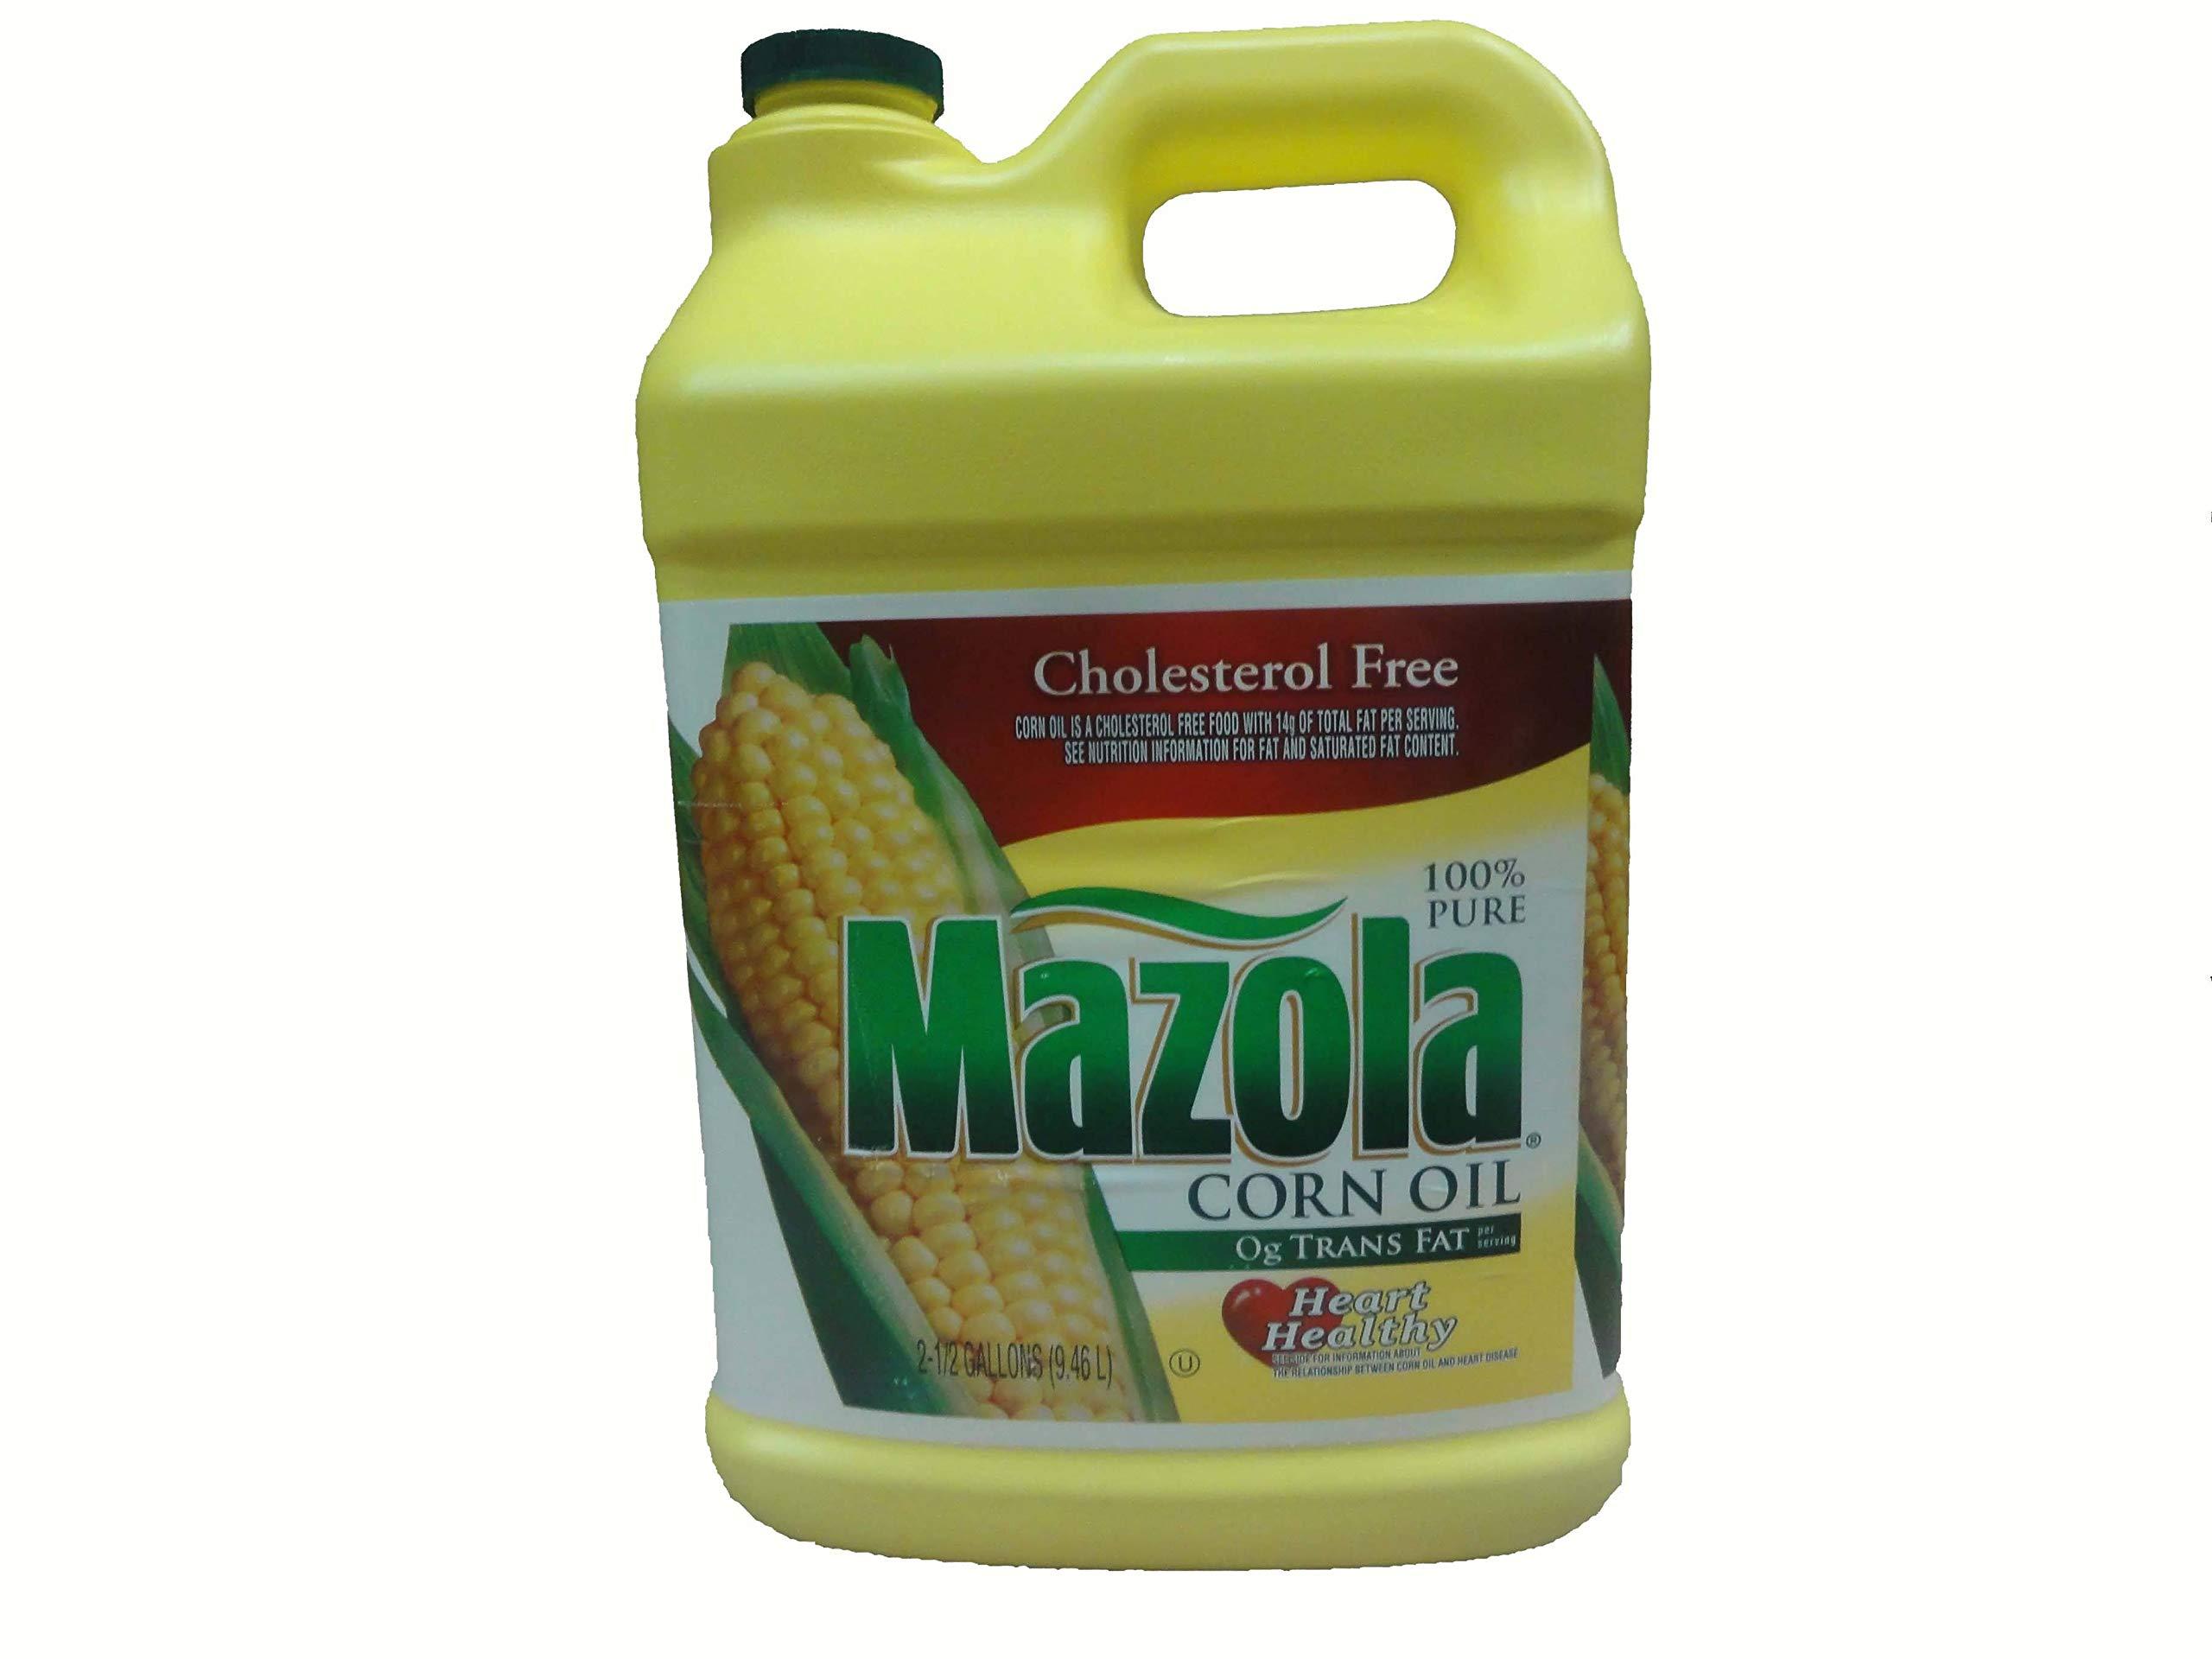 Mazola Corn Oil - 2.5 gallon jug (2 Pack) by MAZOLA ZT